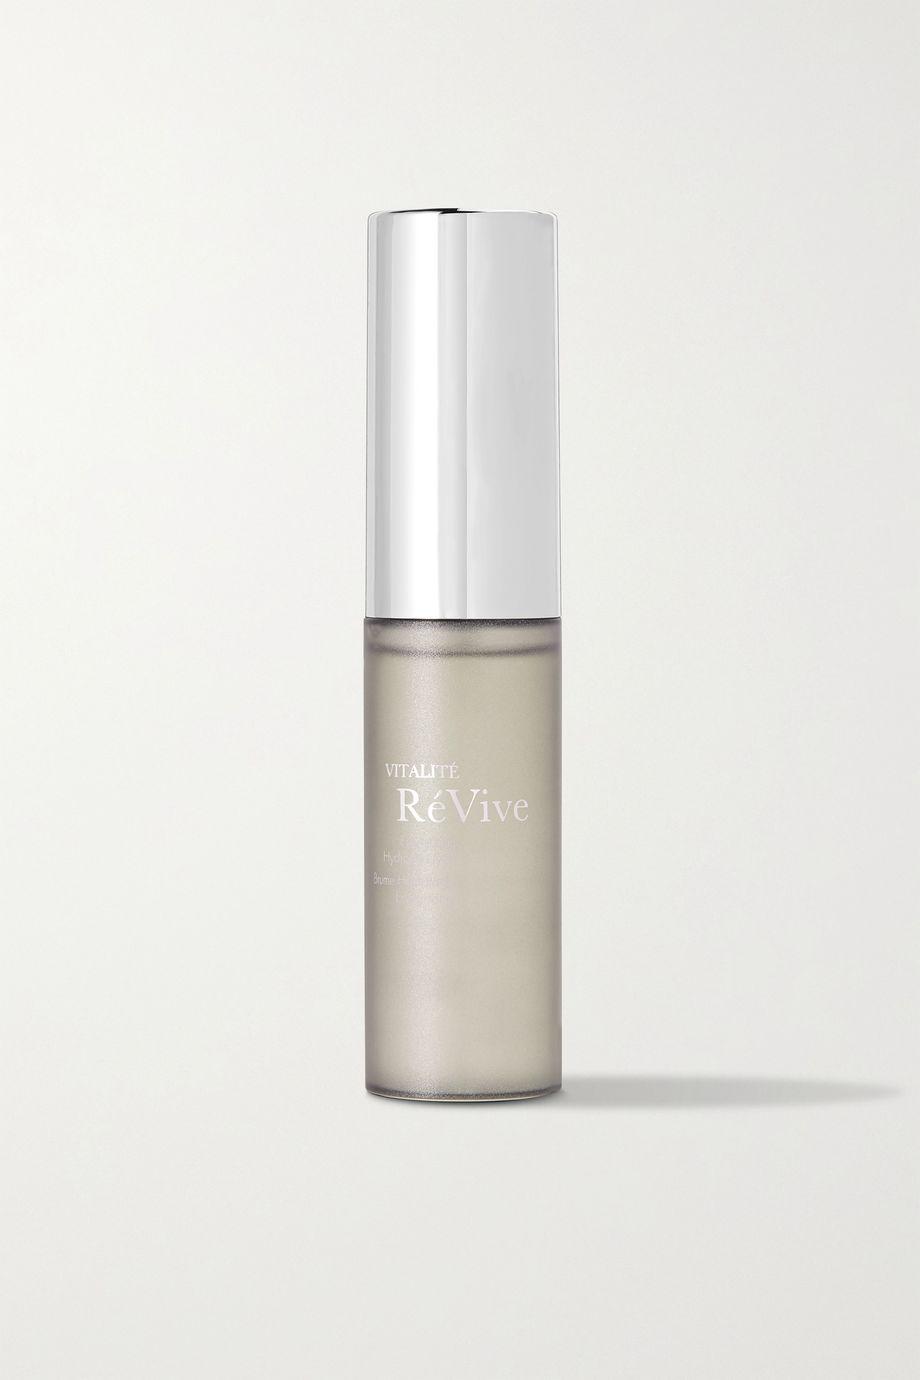 RéVive Vitalité Energizing Hydration Mist, 28.4ml